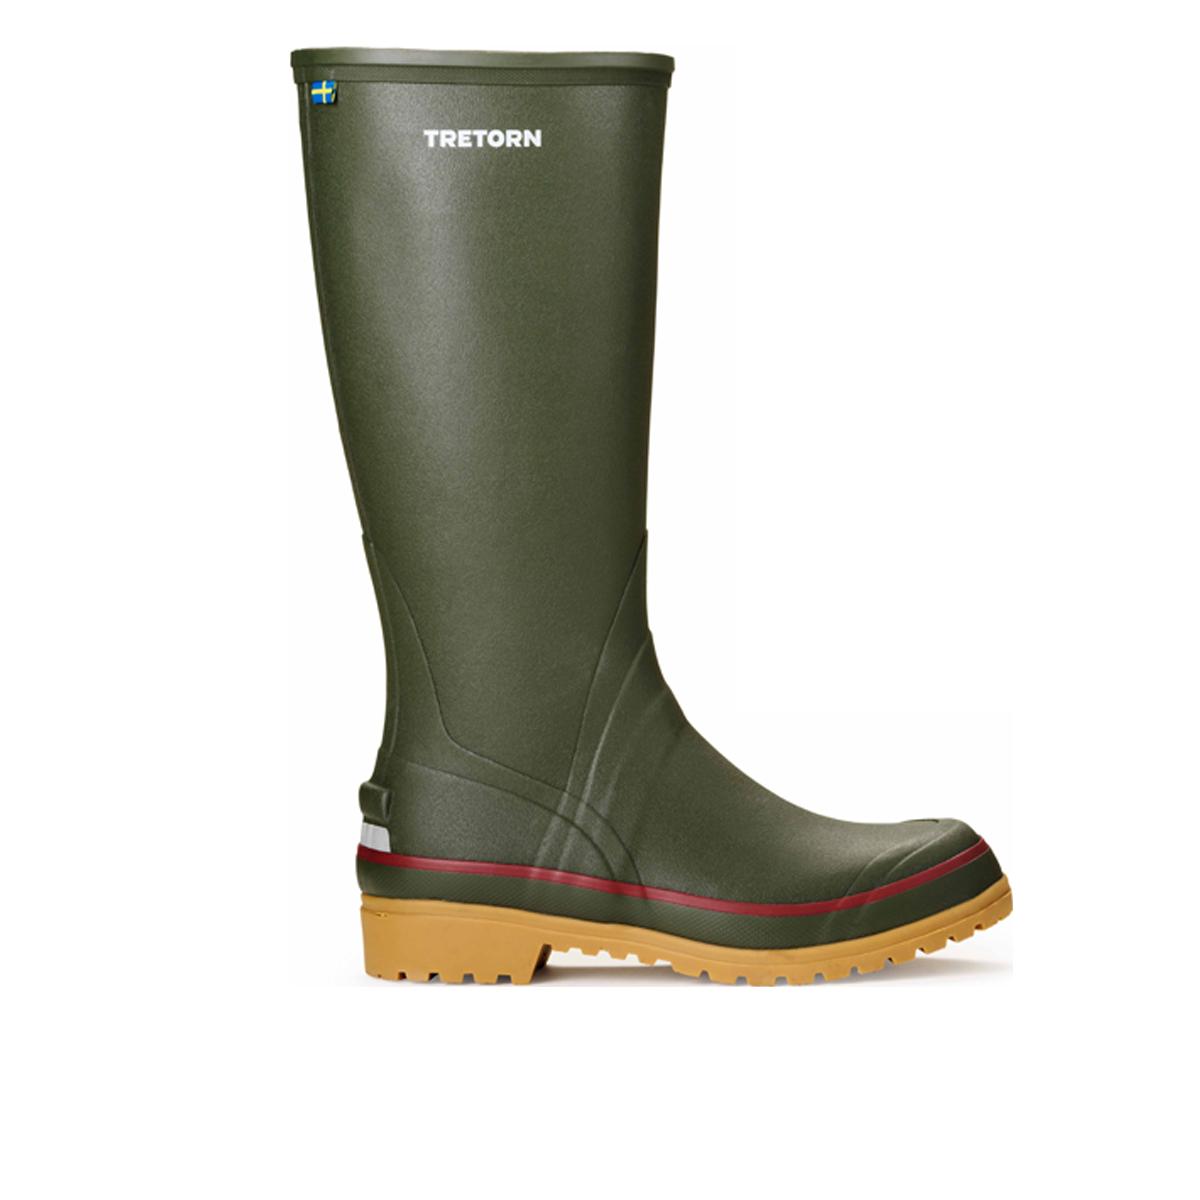 Tretorn Green Sarek 72 Rubber Boots Side